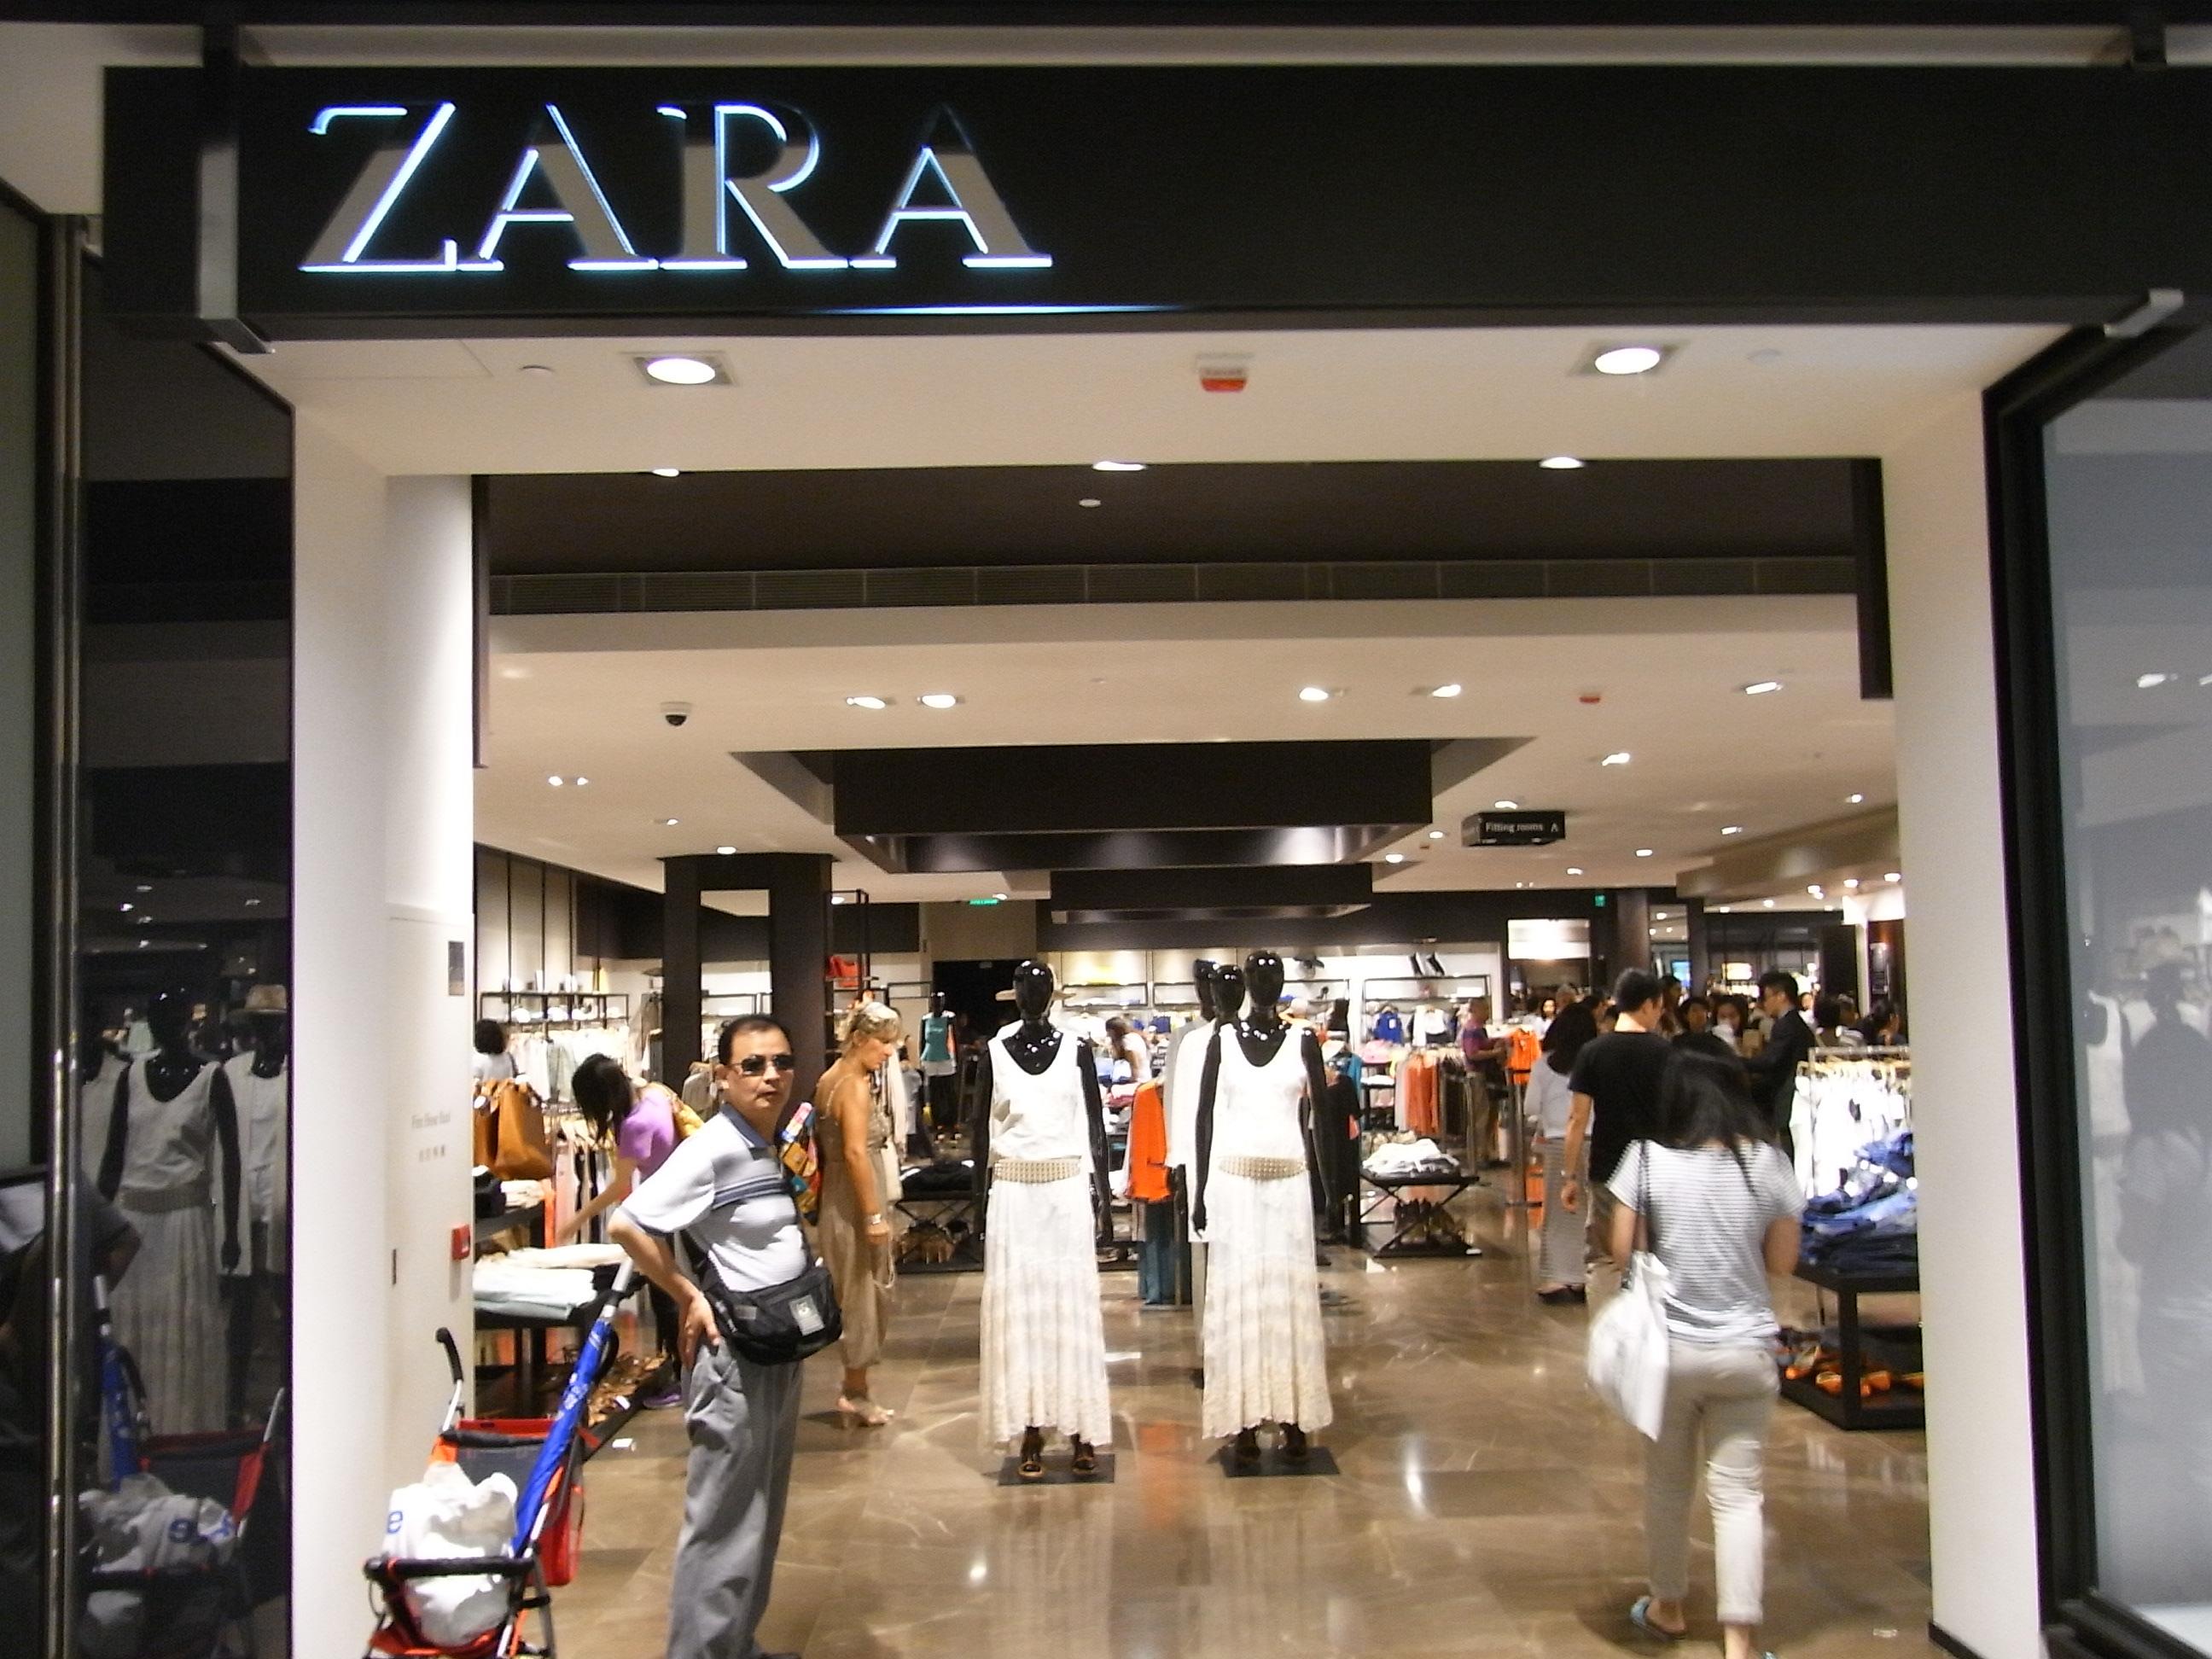 Zara at Fashion Valley - A Shopping Center in San Diego, CA - A 45